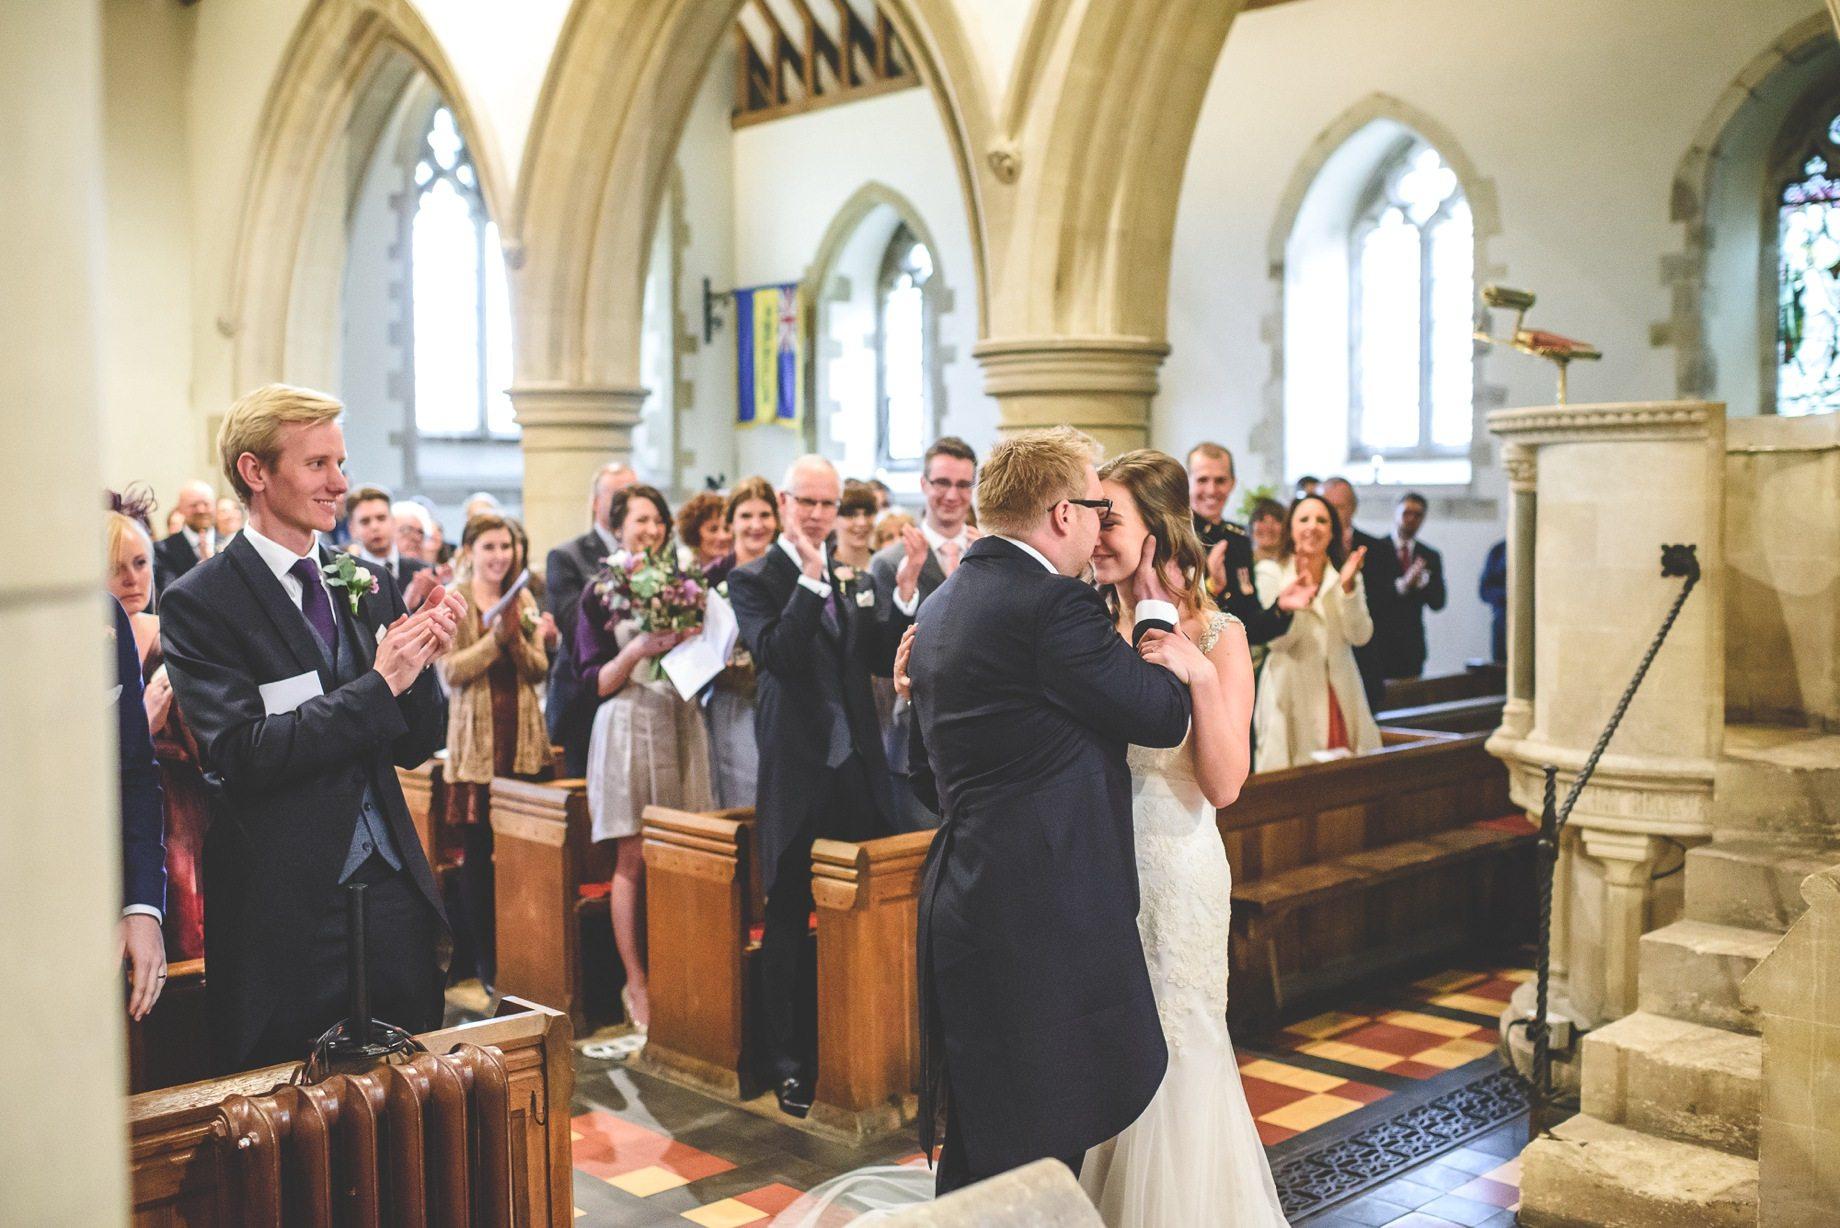 Heather-and-Chris-Hampshire-wedding-photography-73-of-174